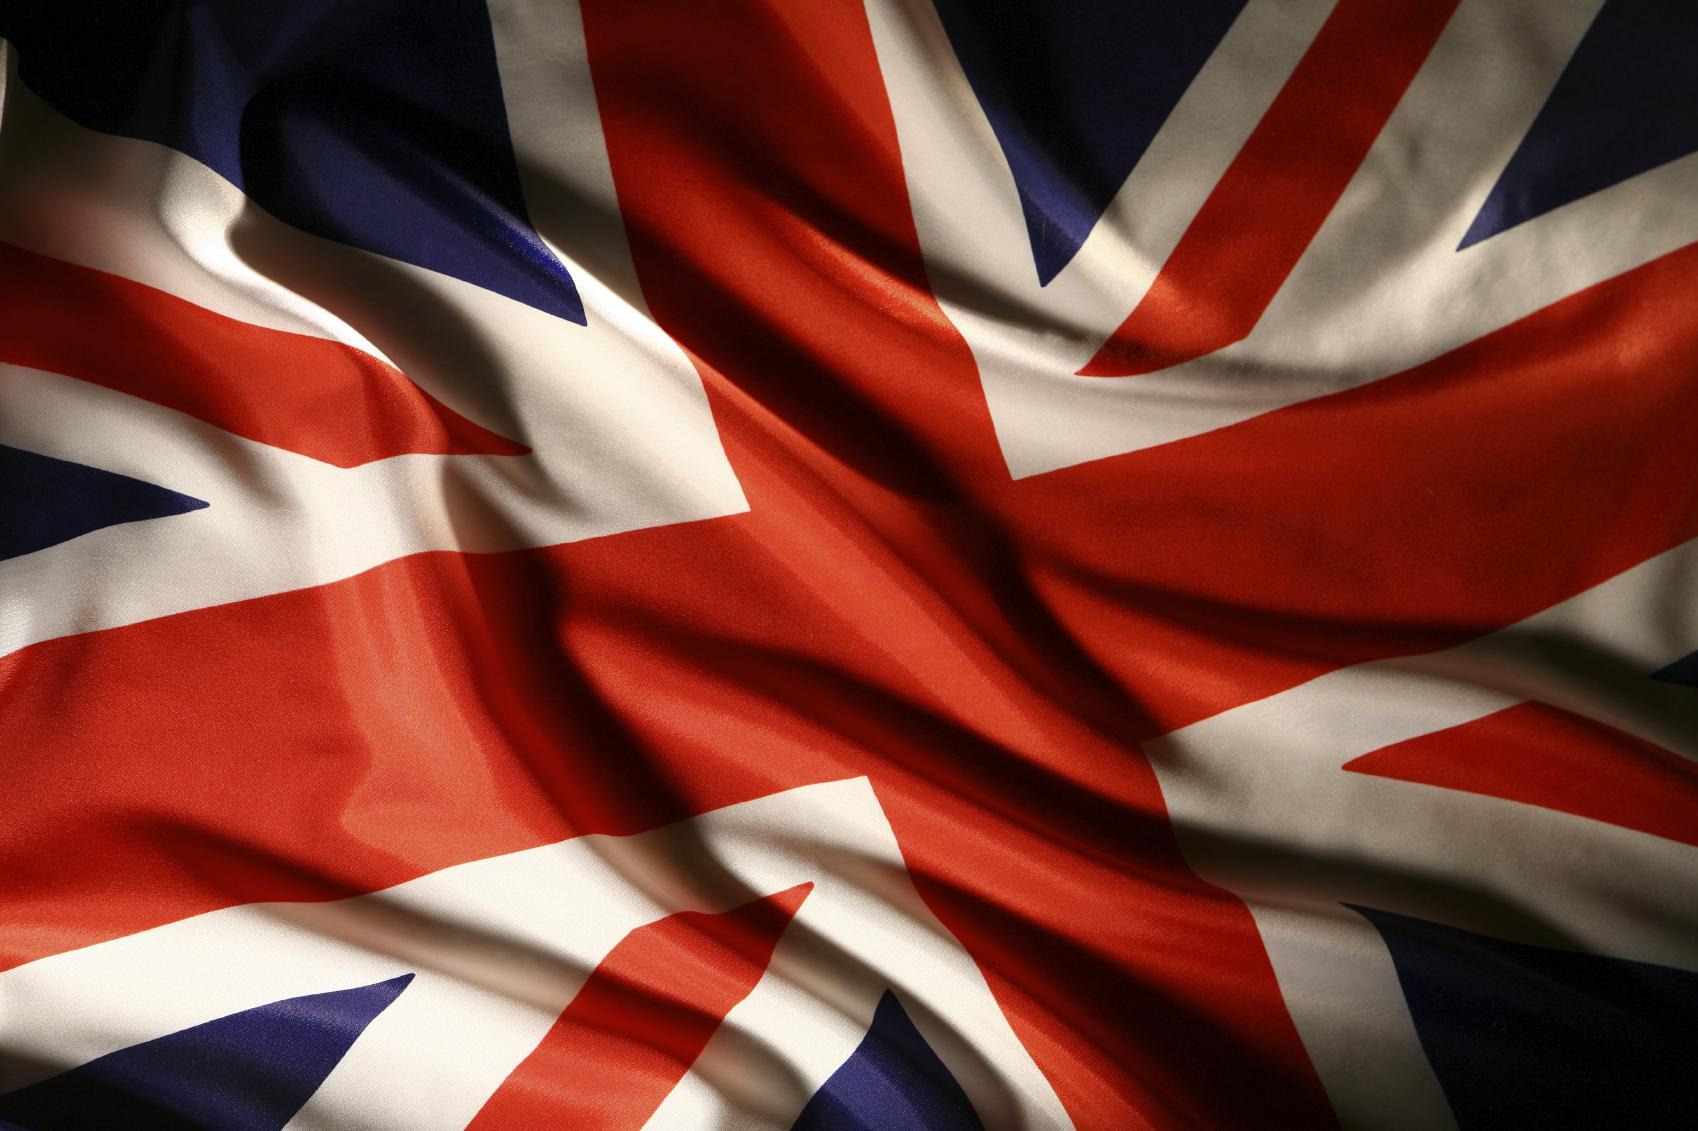 Support UK Manufacturing... Buy British!